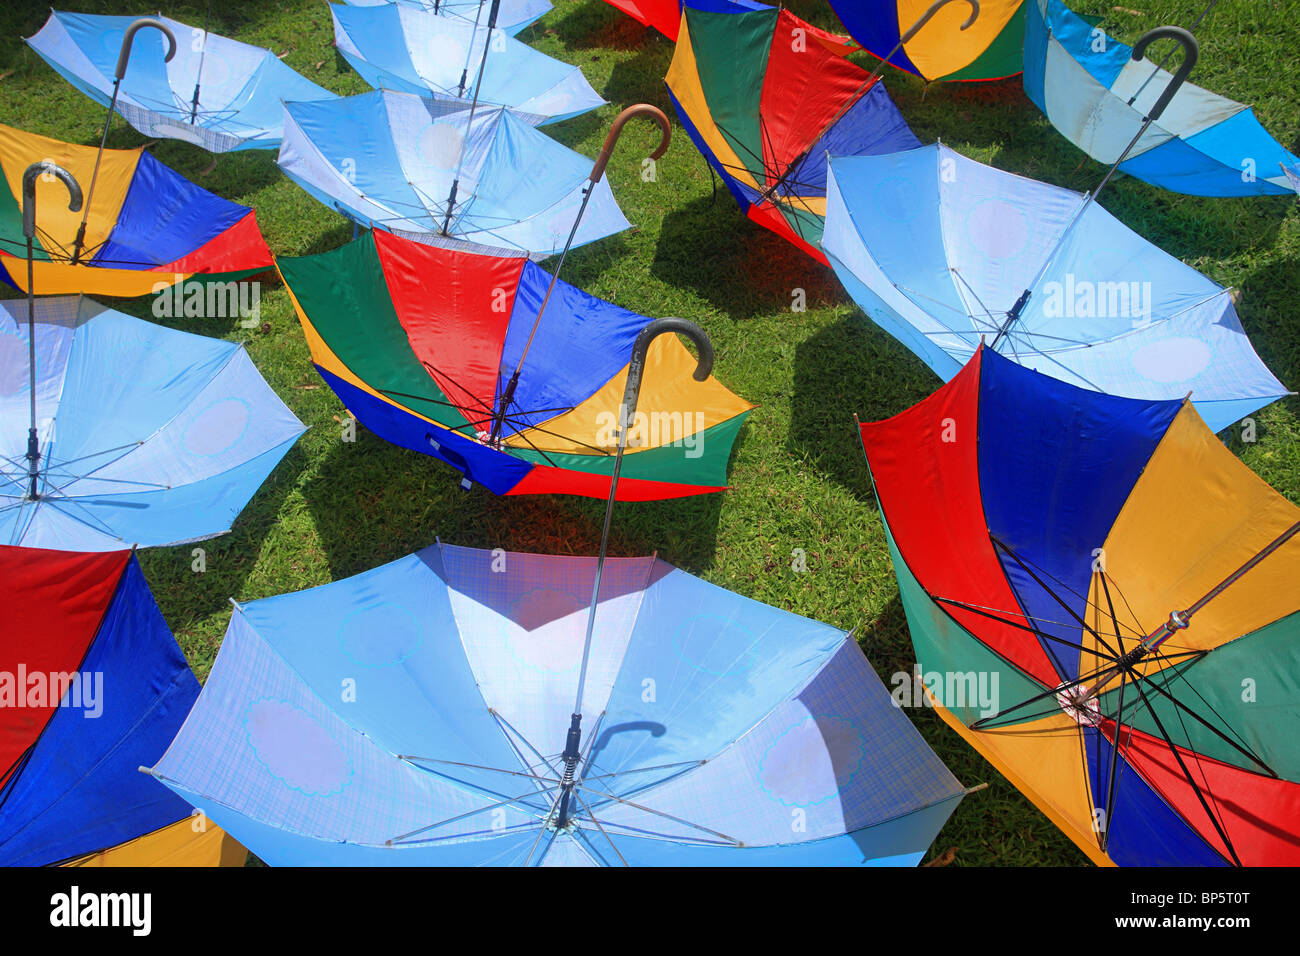 Umbrellas for sun protection, borobudur, indonesia - Stock Image